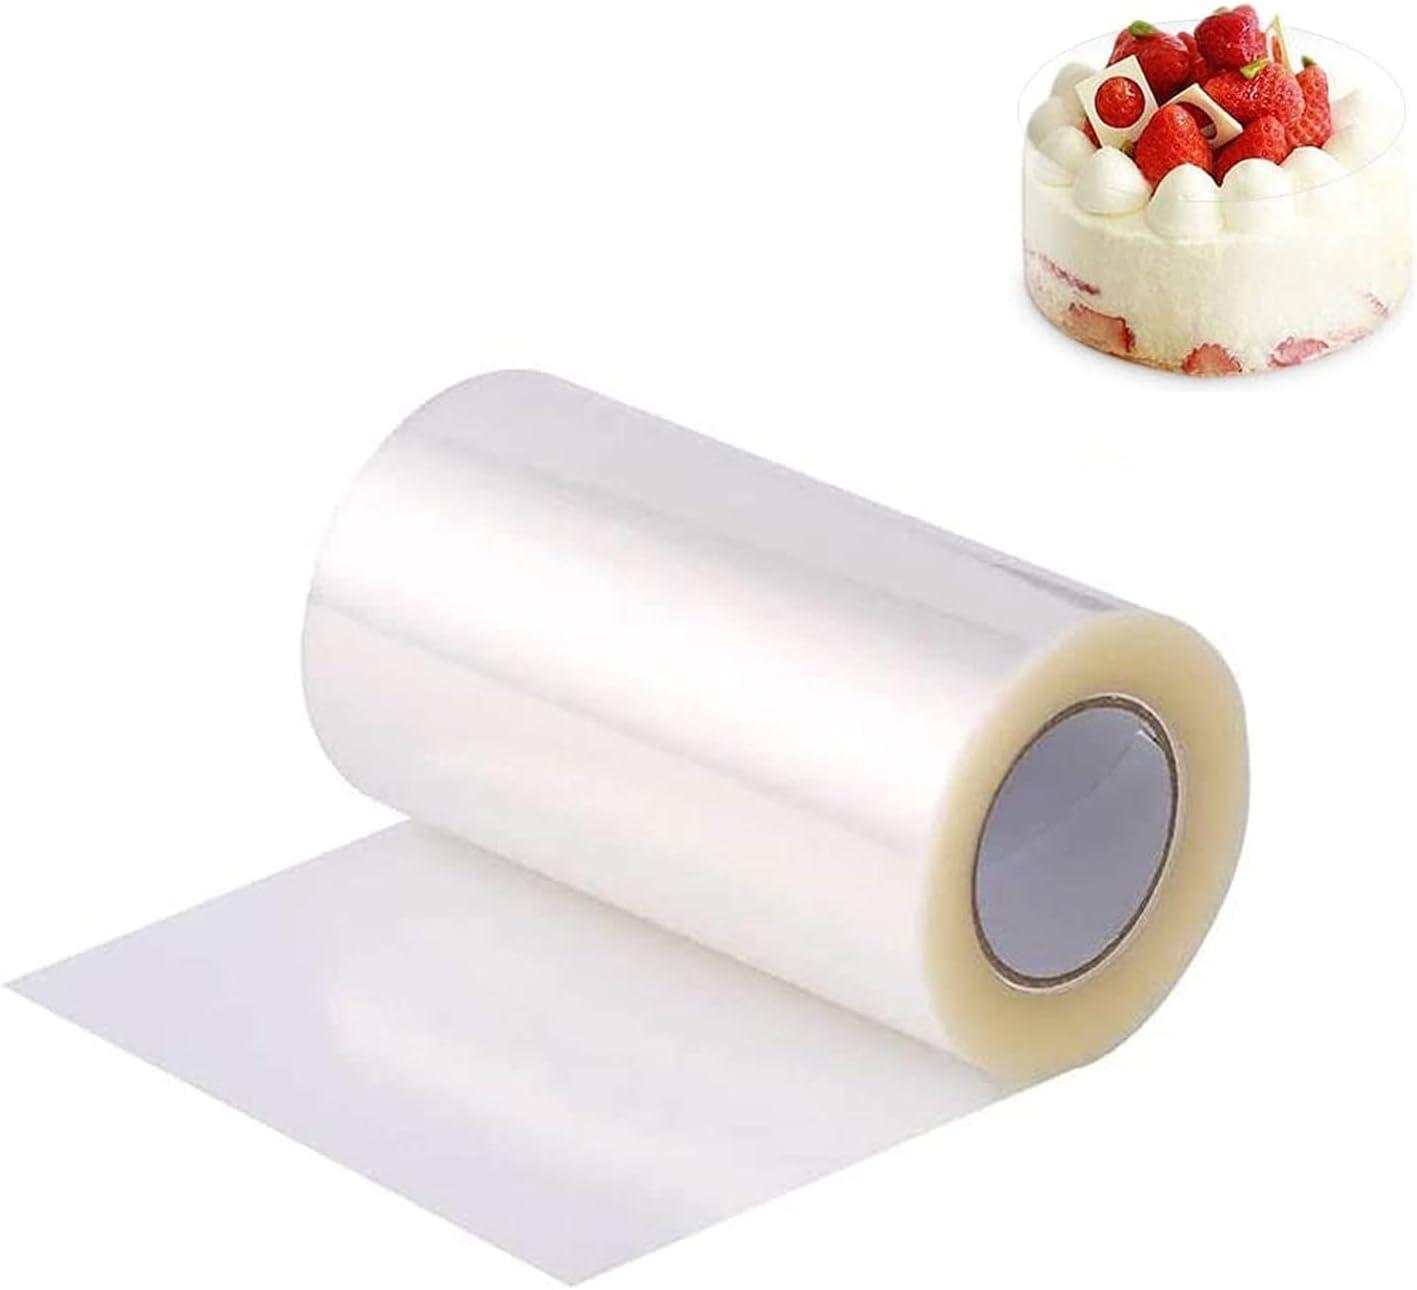 ZEACCT Rollo de Acetato Reposteria, Acetato Transparente Pastel, 10cm Ancho Rollo Modelar Transparente de Acetato Para Tartas Para Decoración de Repostería y Chocolate Mousse(10cm*10m)